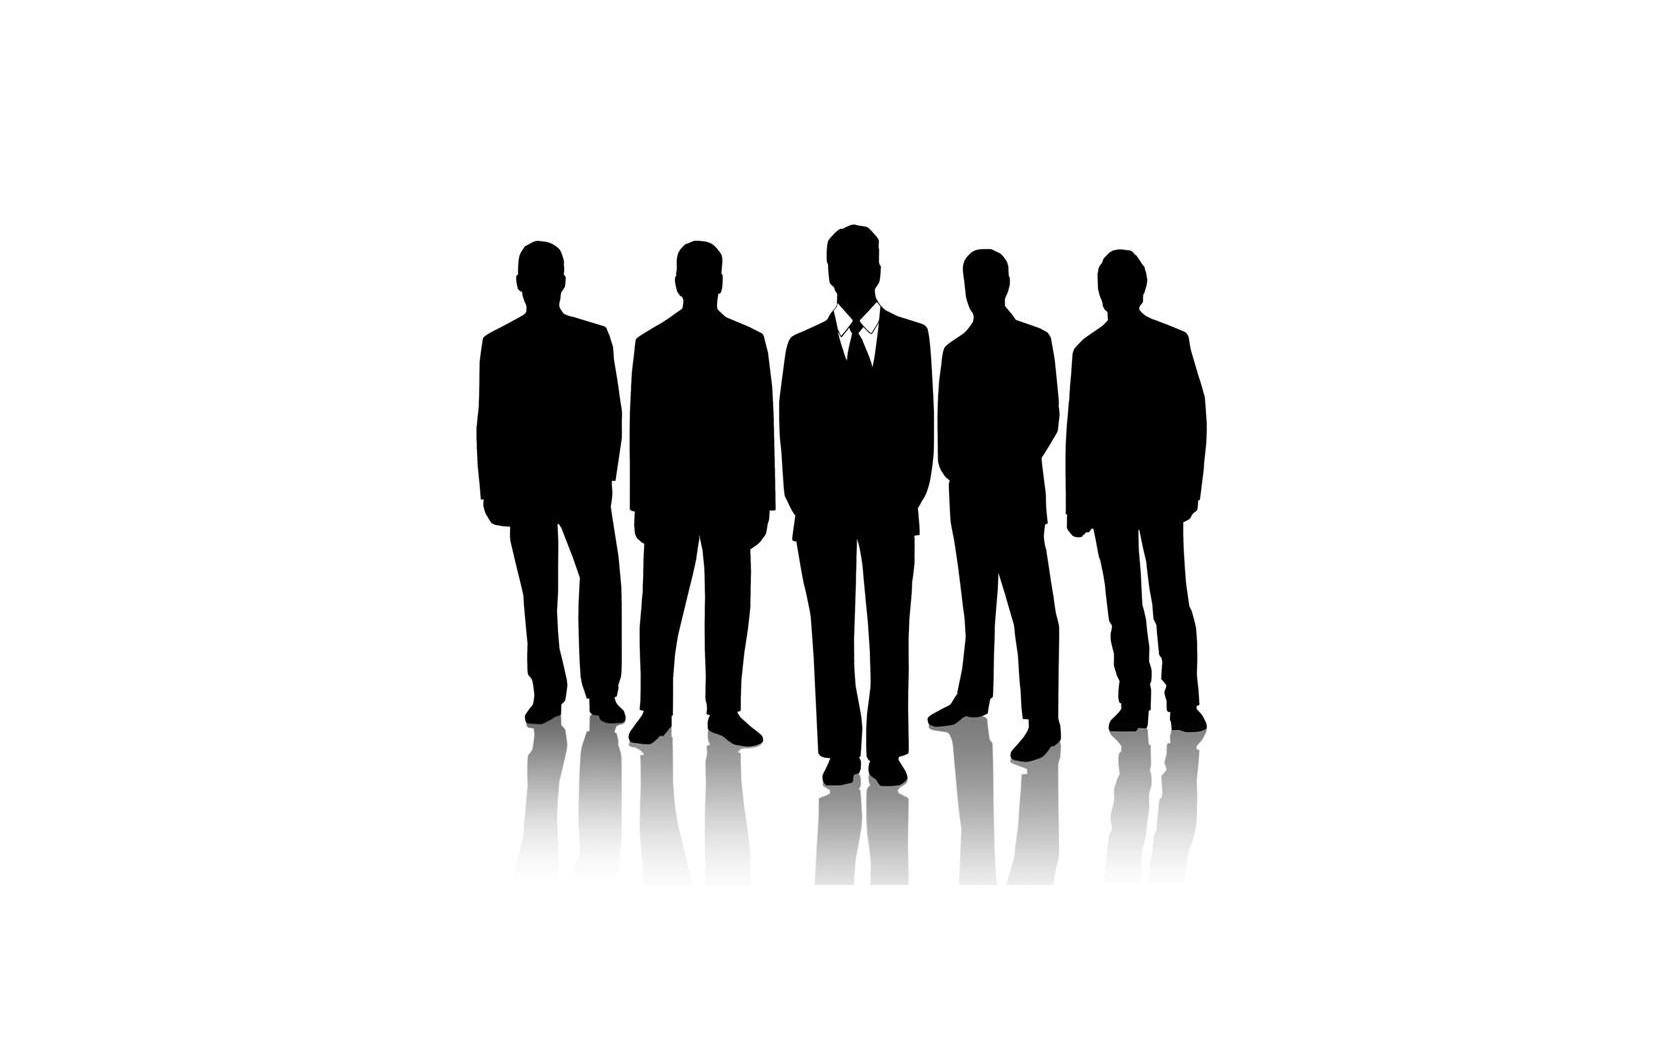 1680x1050 Suit Silhouette Business Backgrounds Presnetation